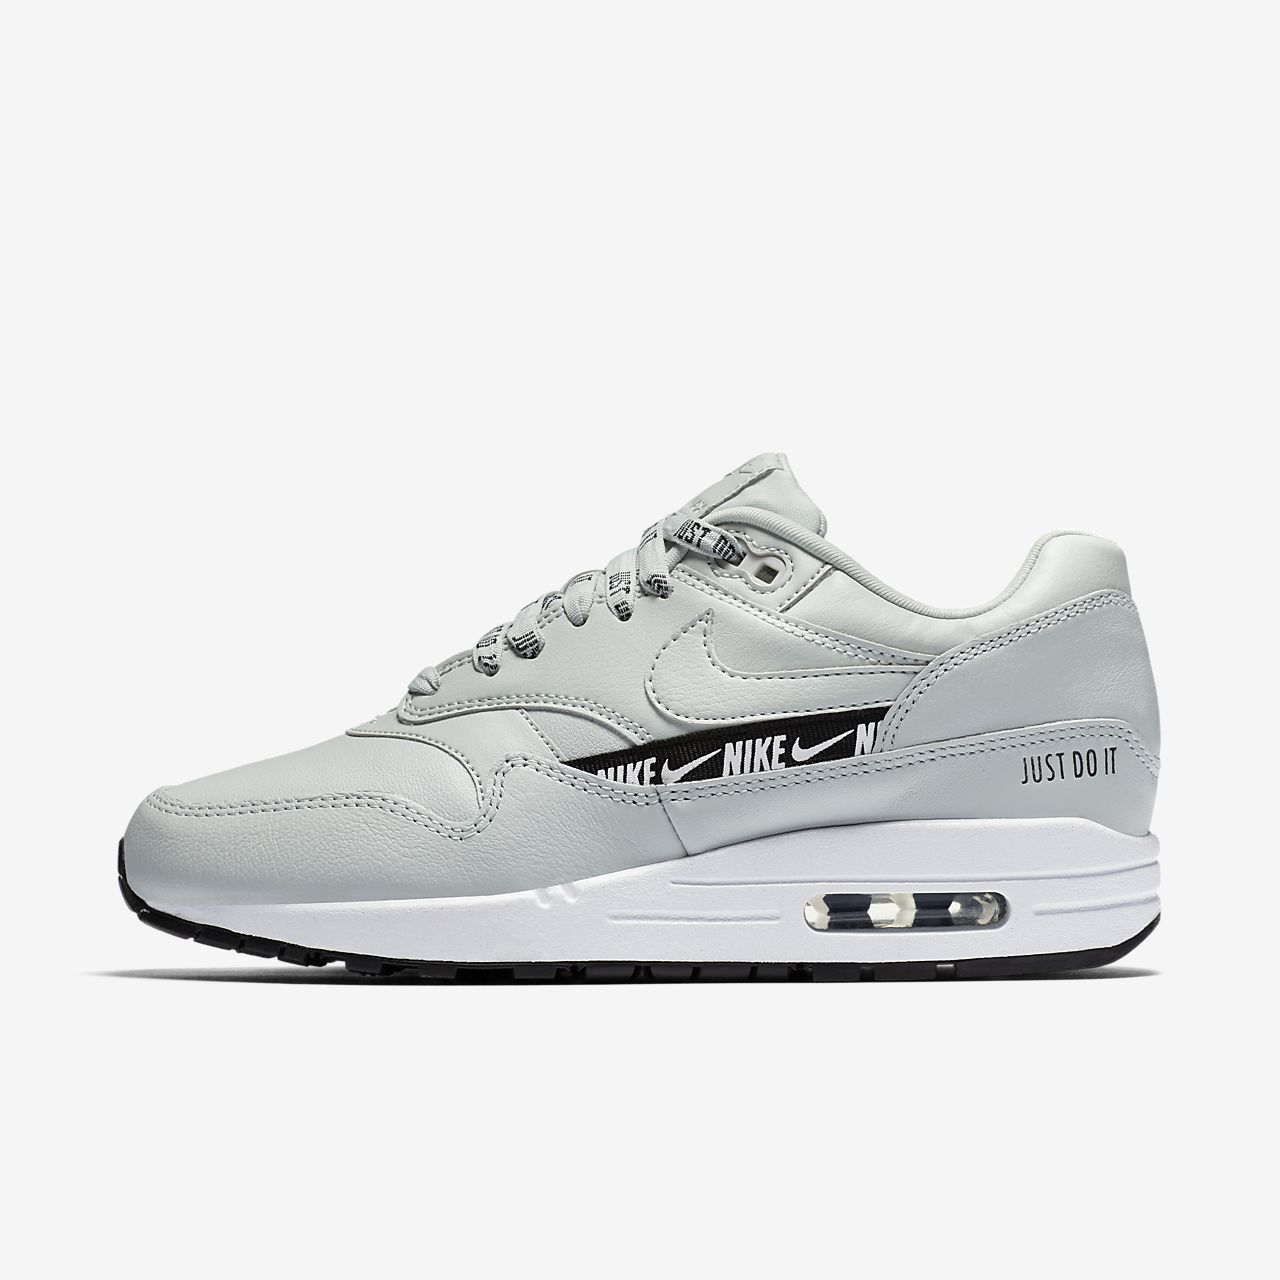 Se Max Damesschoen ch 1 Overbranded Air Nike qnpWgROaw1